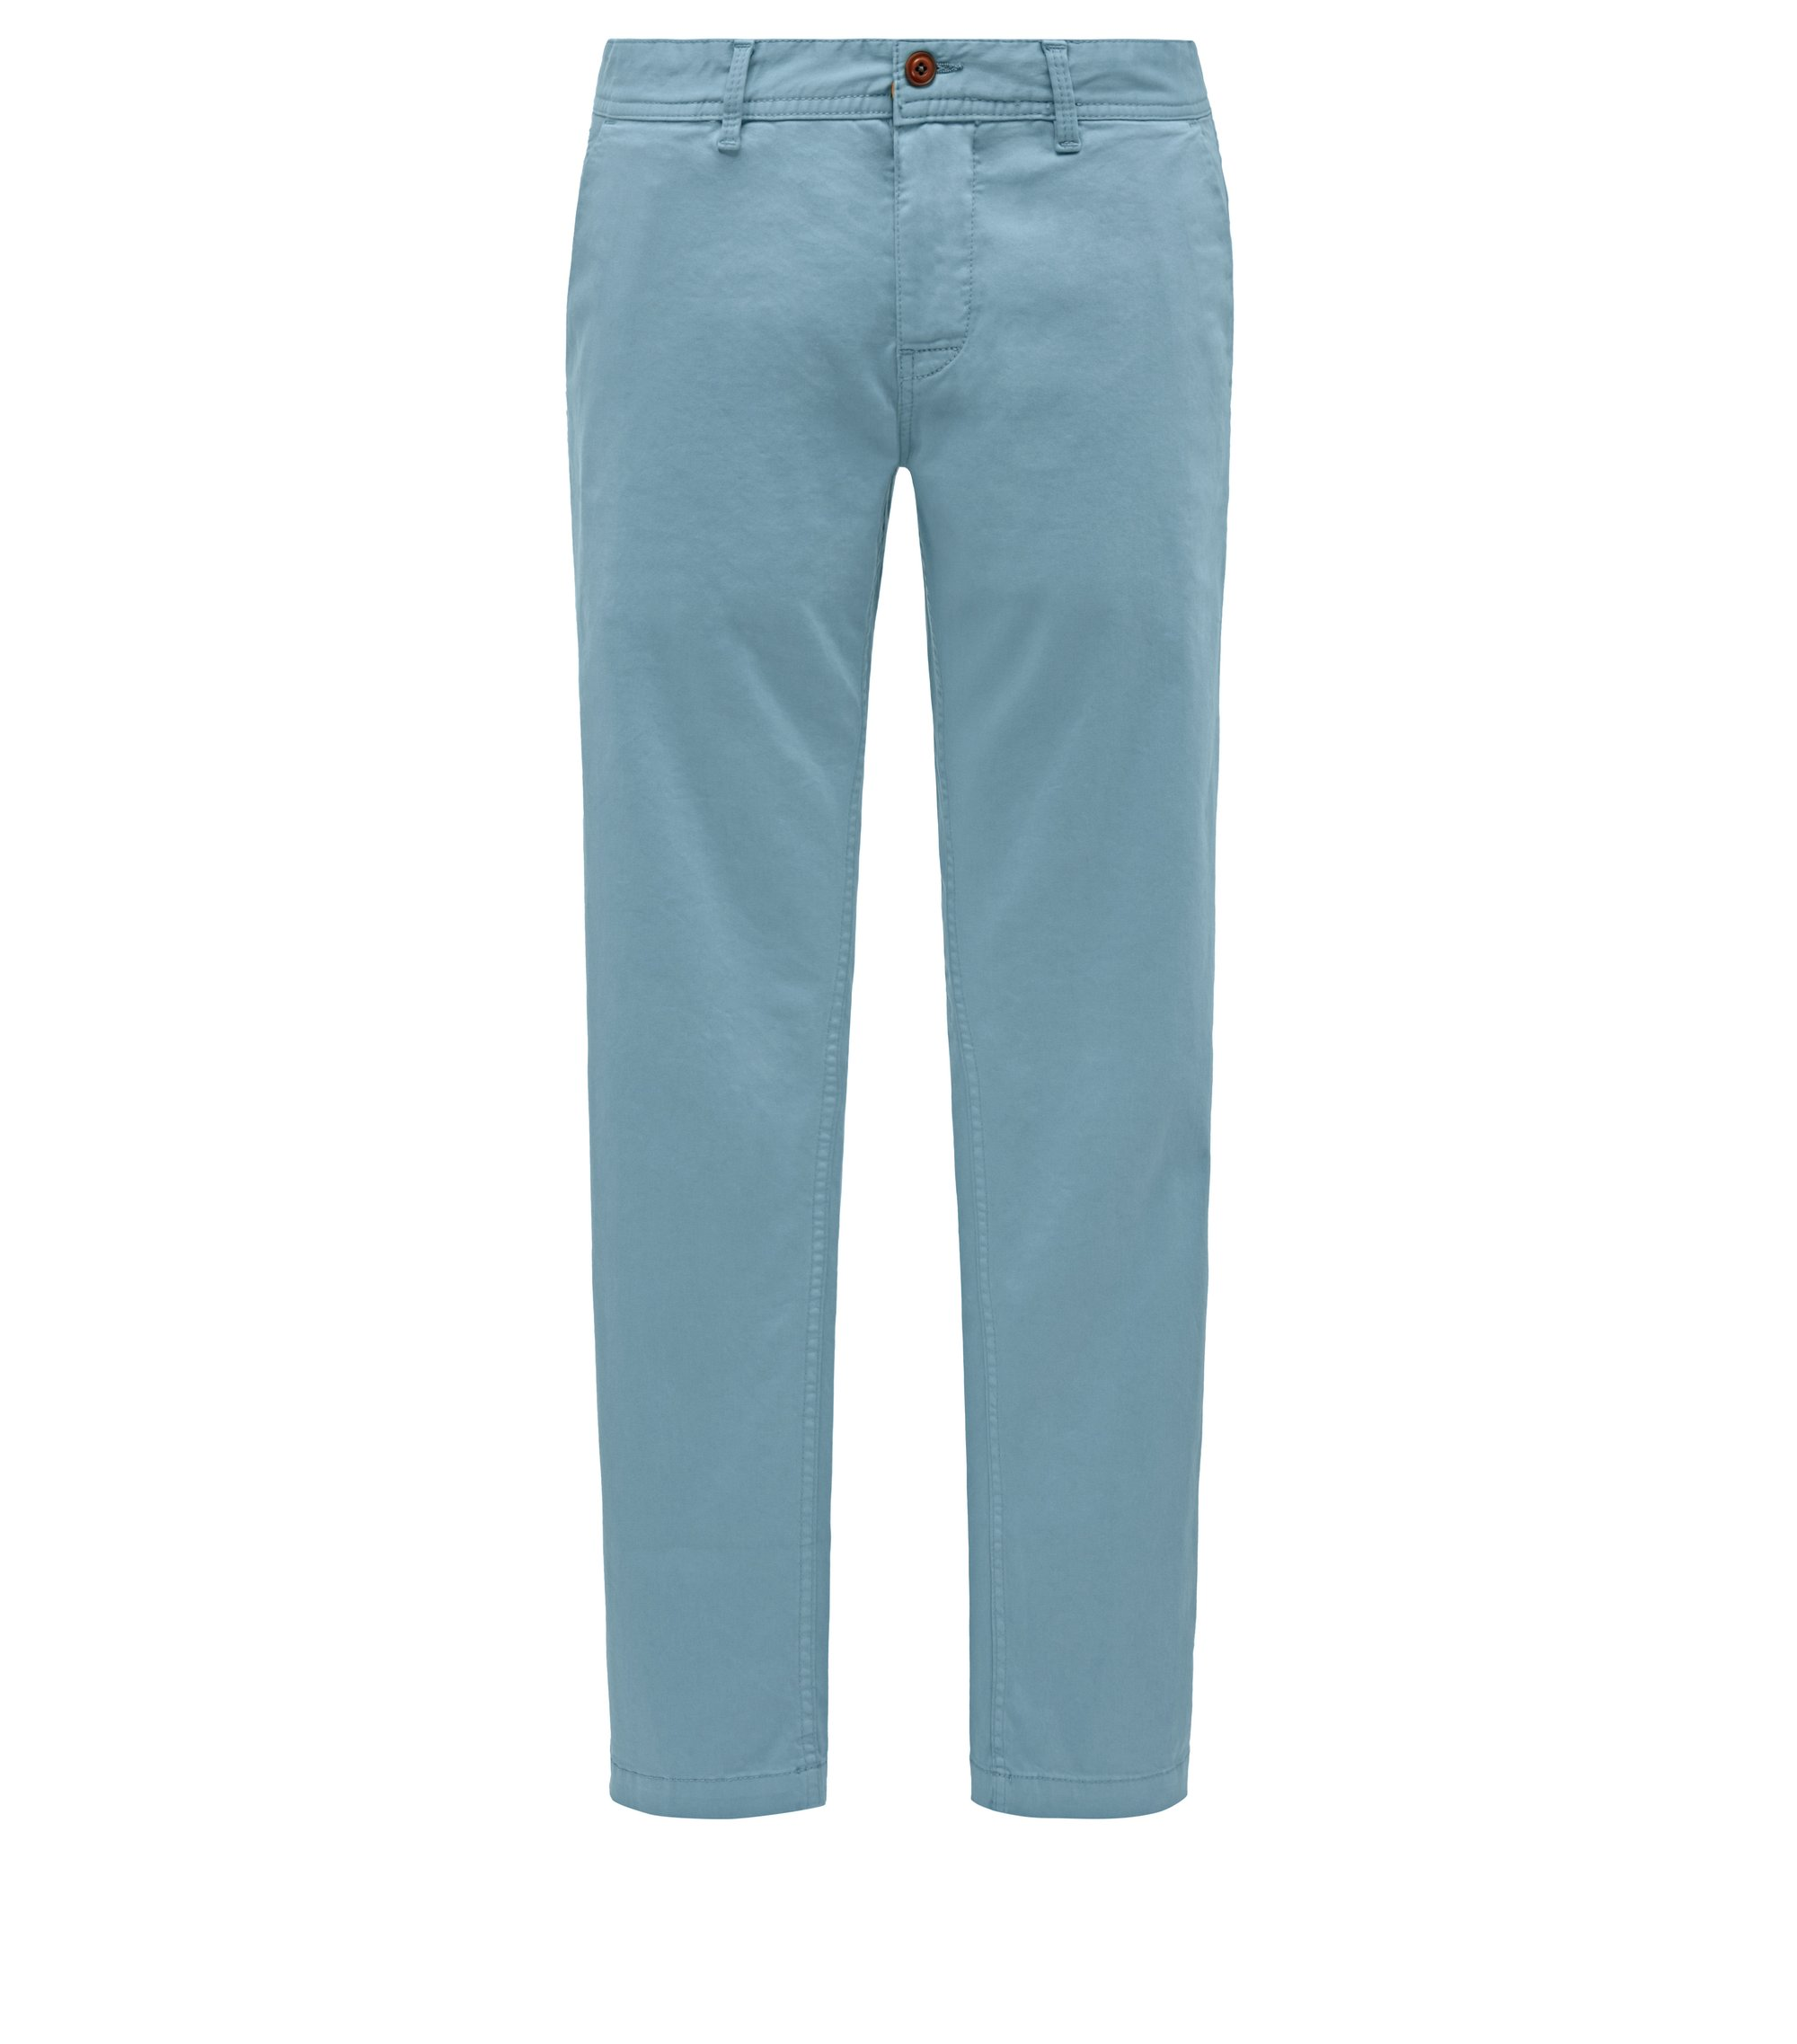 Stretch Cotton Chino Pants, Slim Fit | Schino Slim D, Light Blue